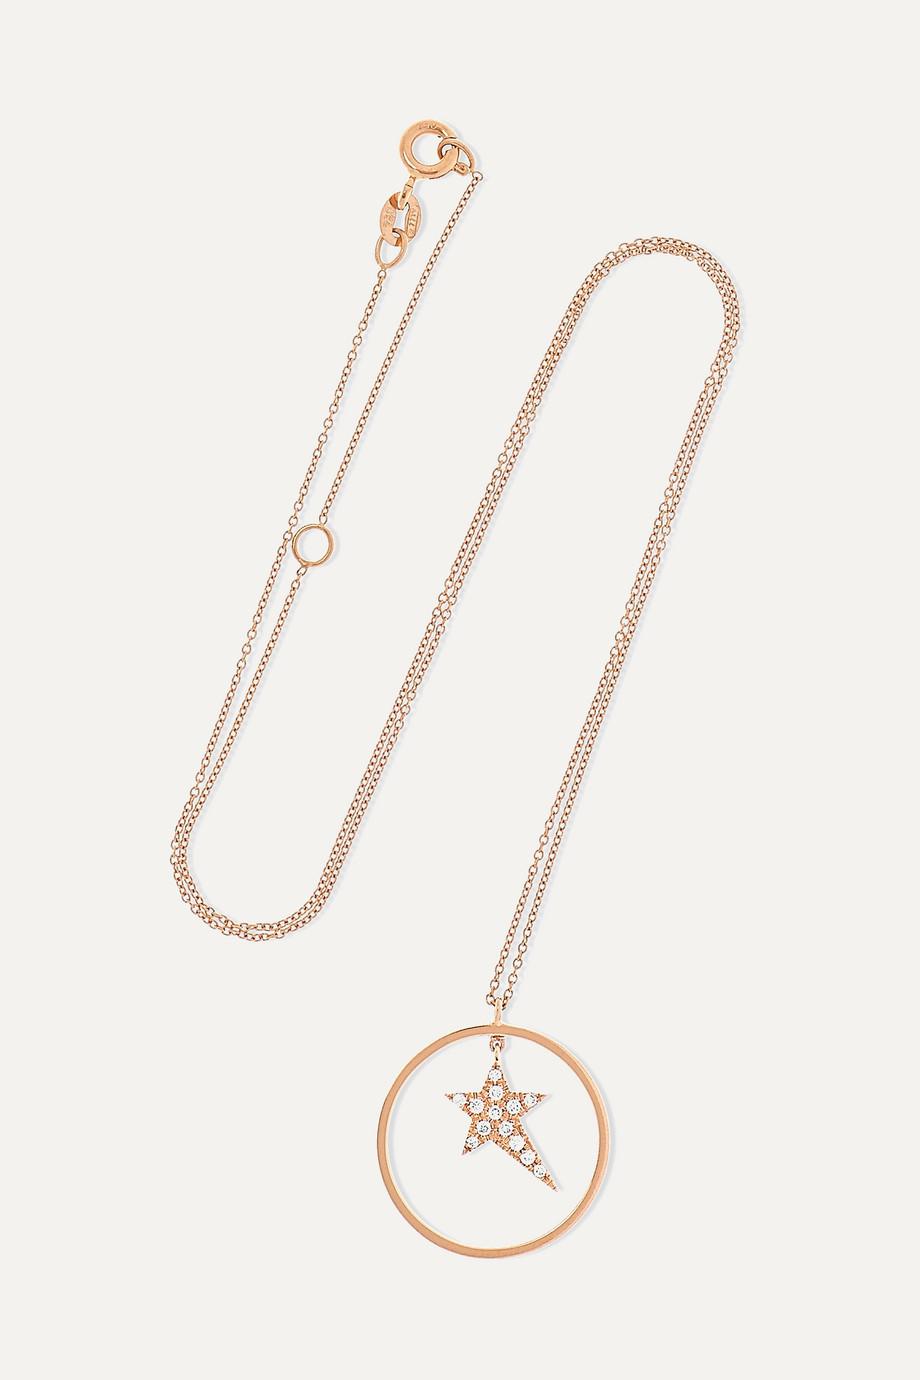 Diane Kordas Star Charm 18-karat rose gold diamond necklace